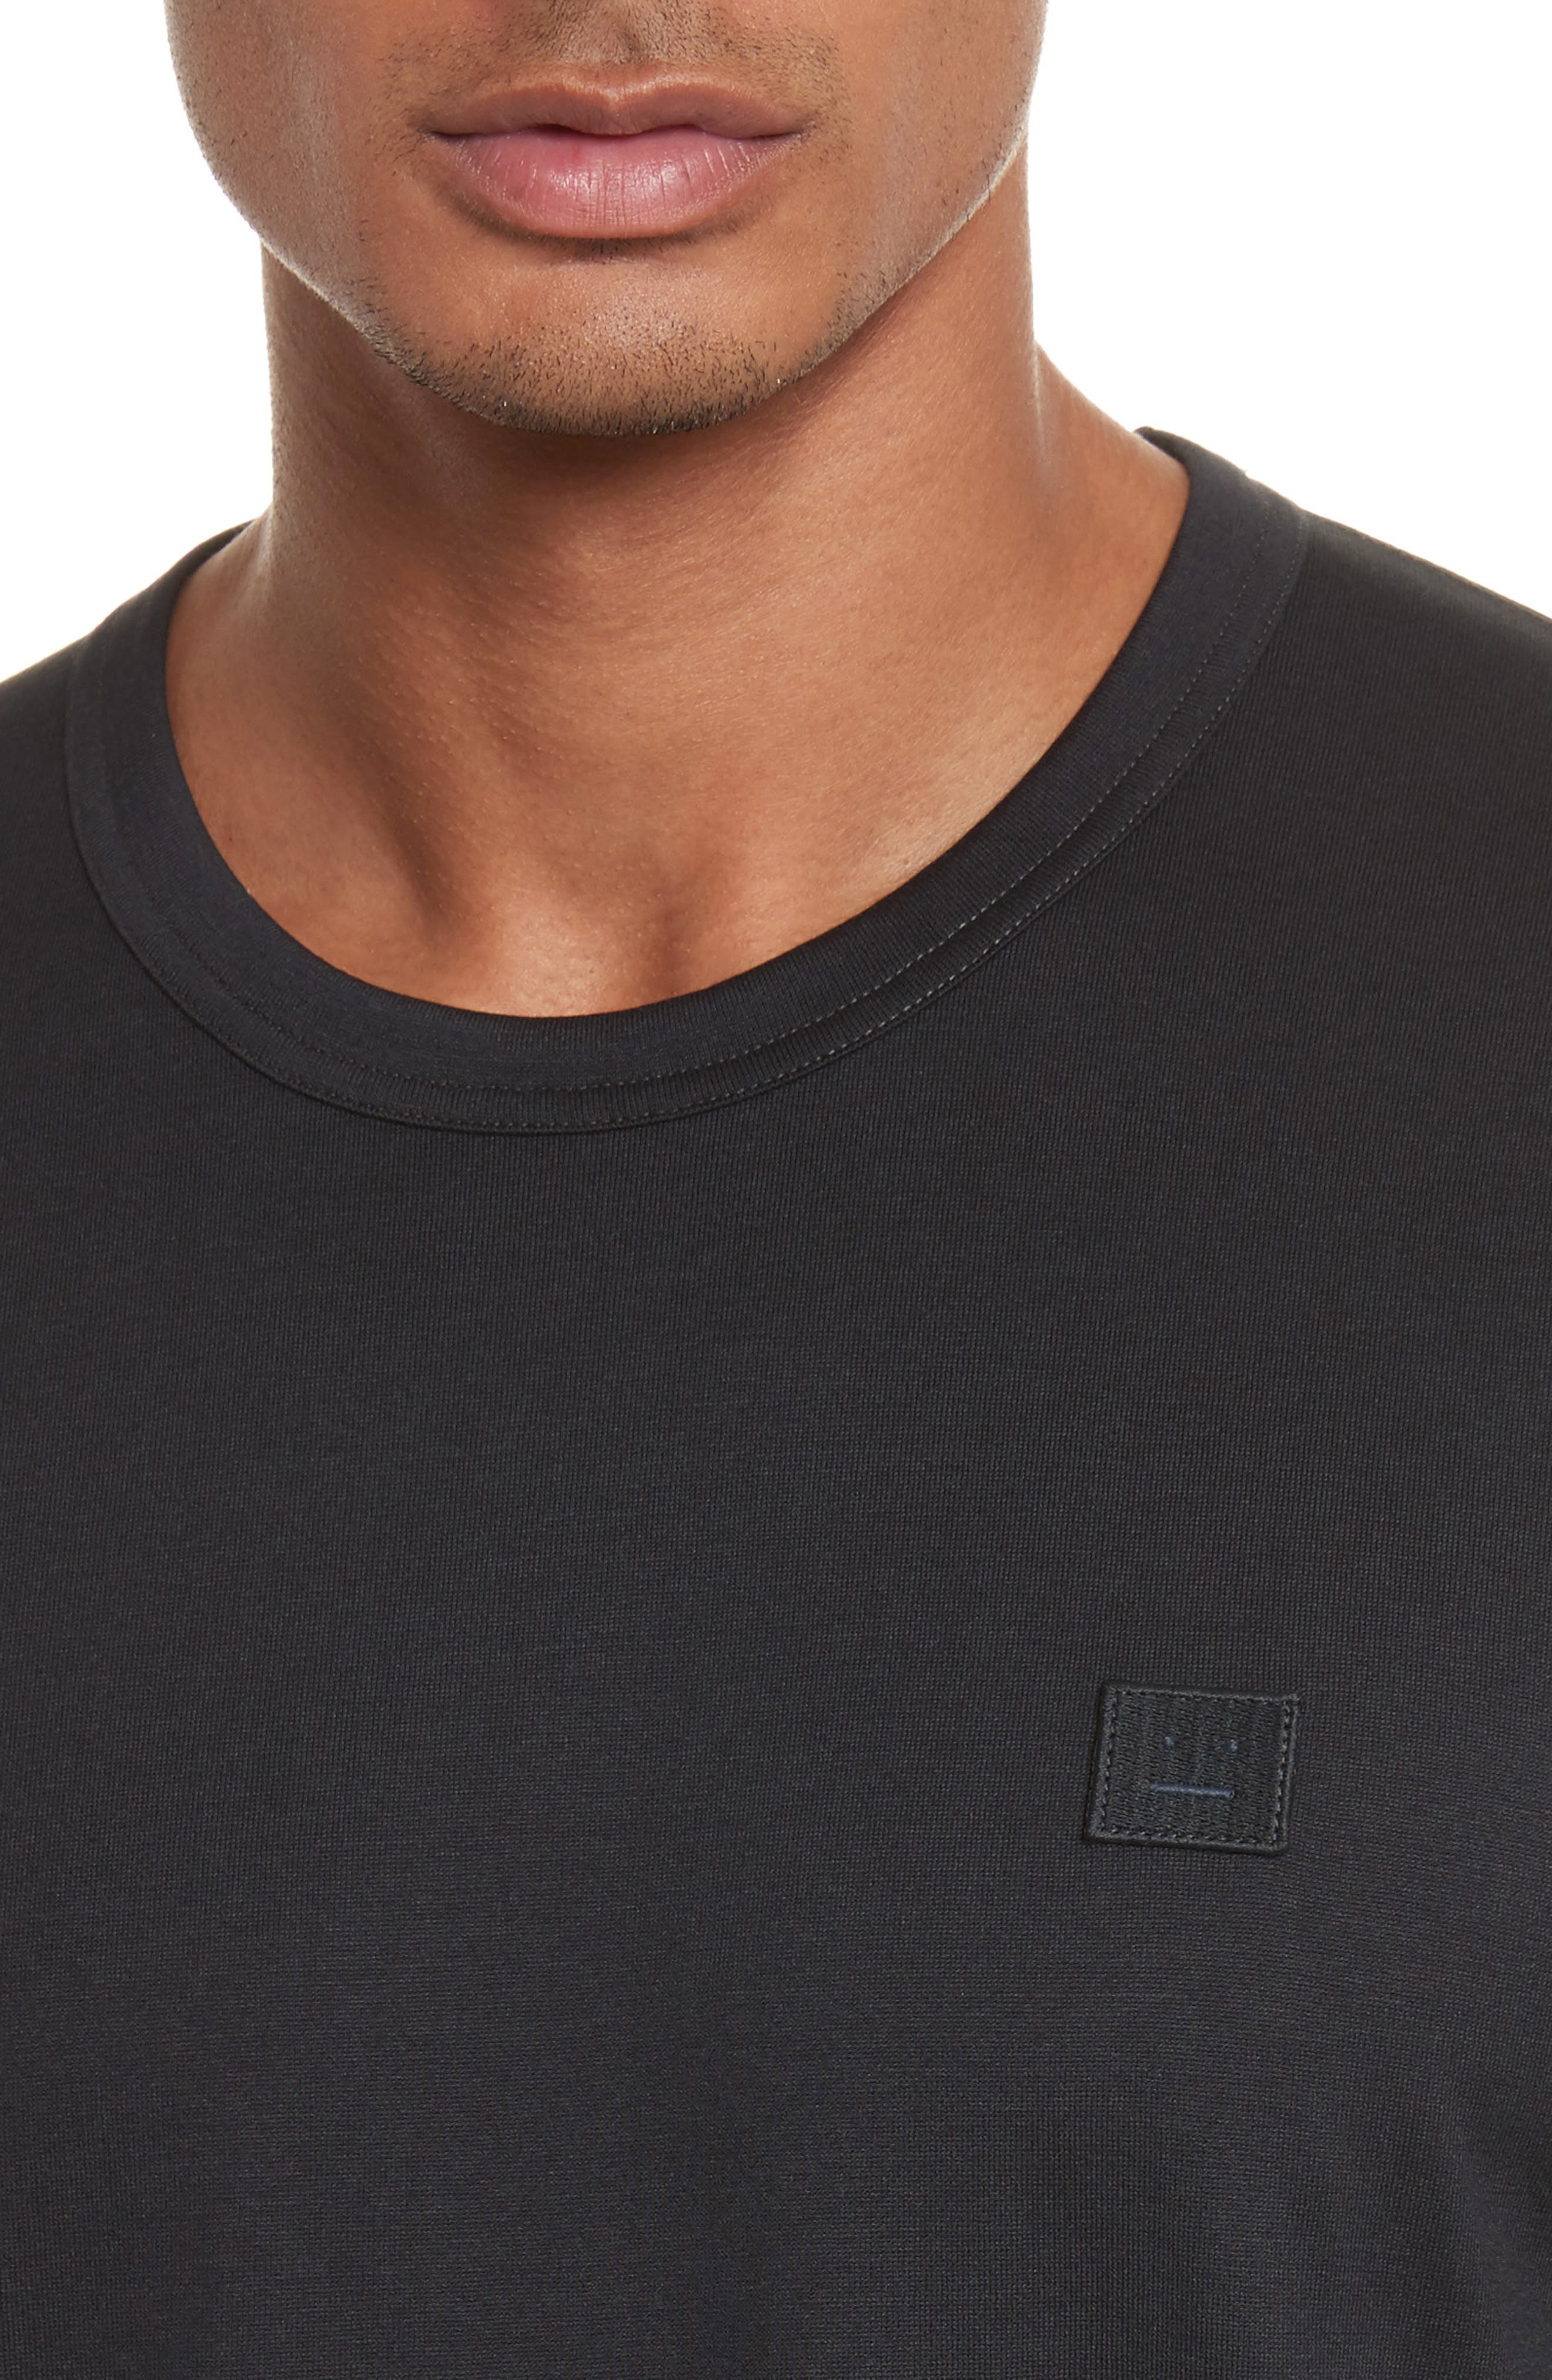 Nash Face T-Shirt,                             Alternate thumbnail 4, color,                             001